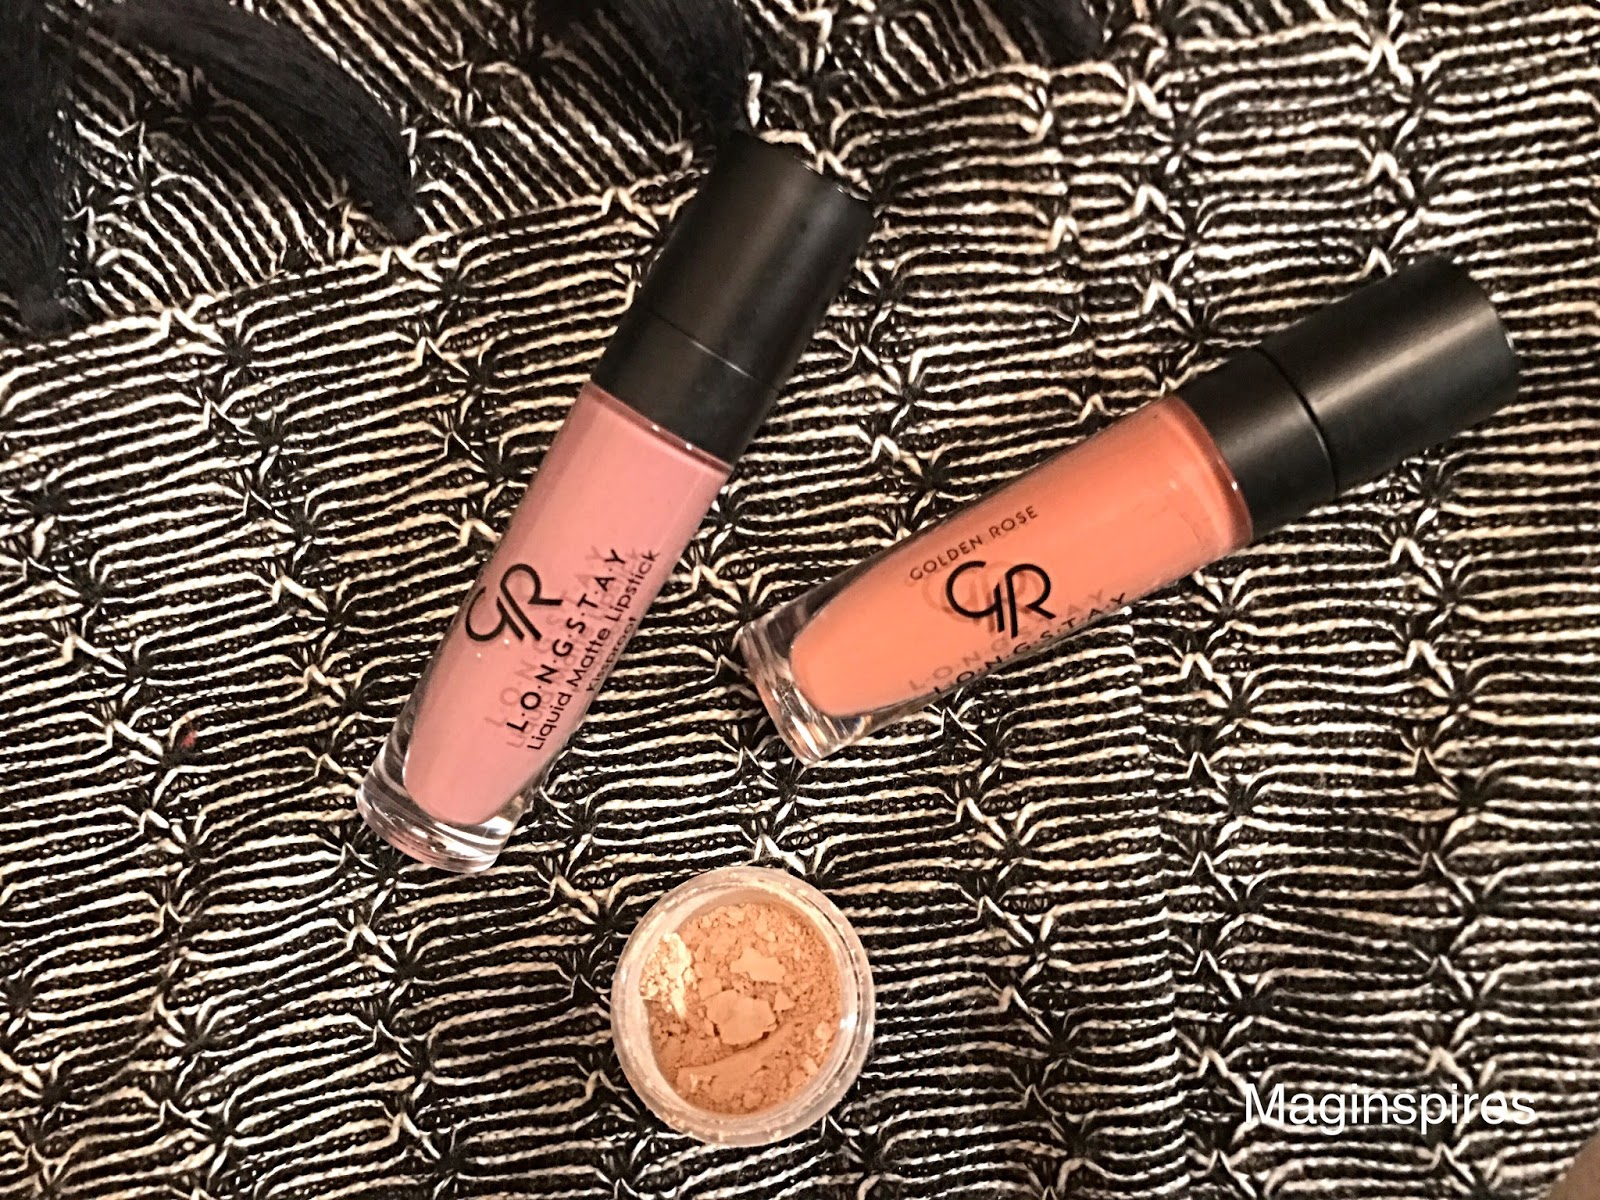 Golden Rose Longstay Liquid Matte Lipstick: Test trwałości (kolory numer 10 oraz 13)